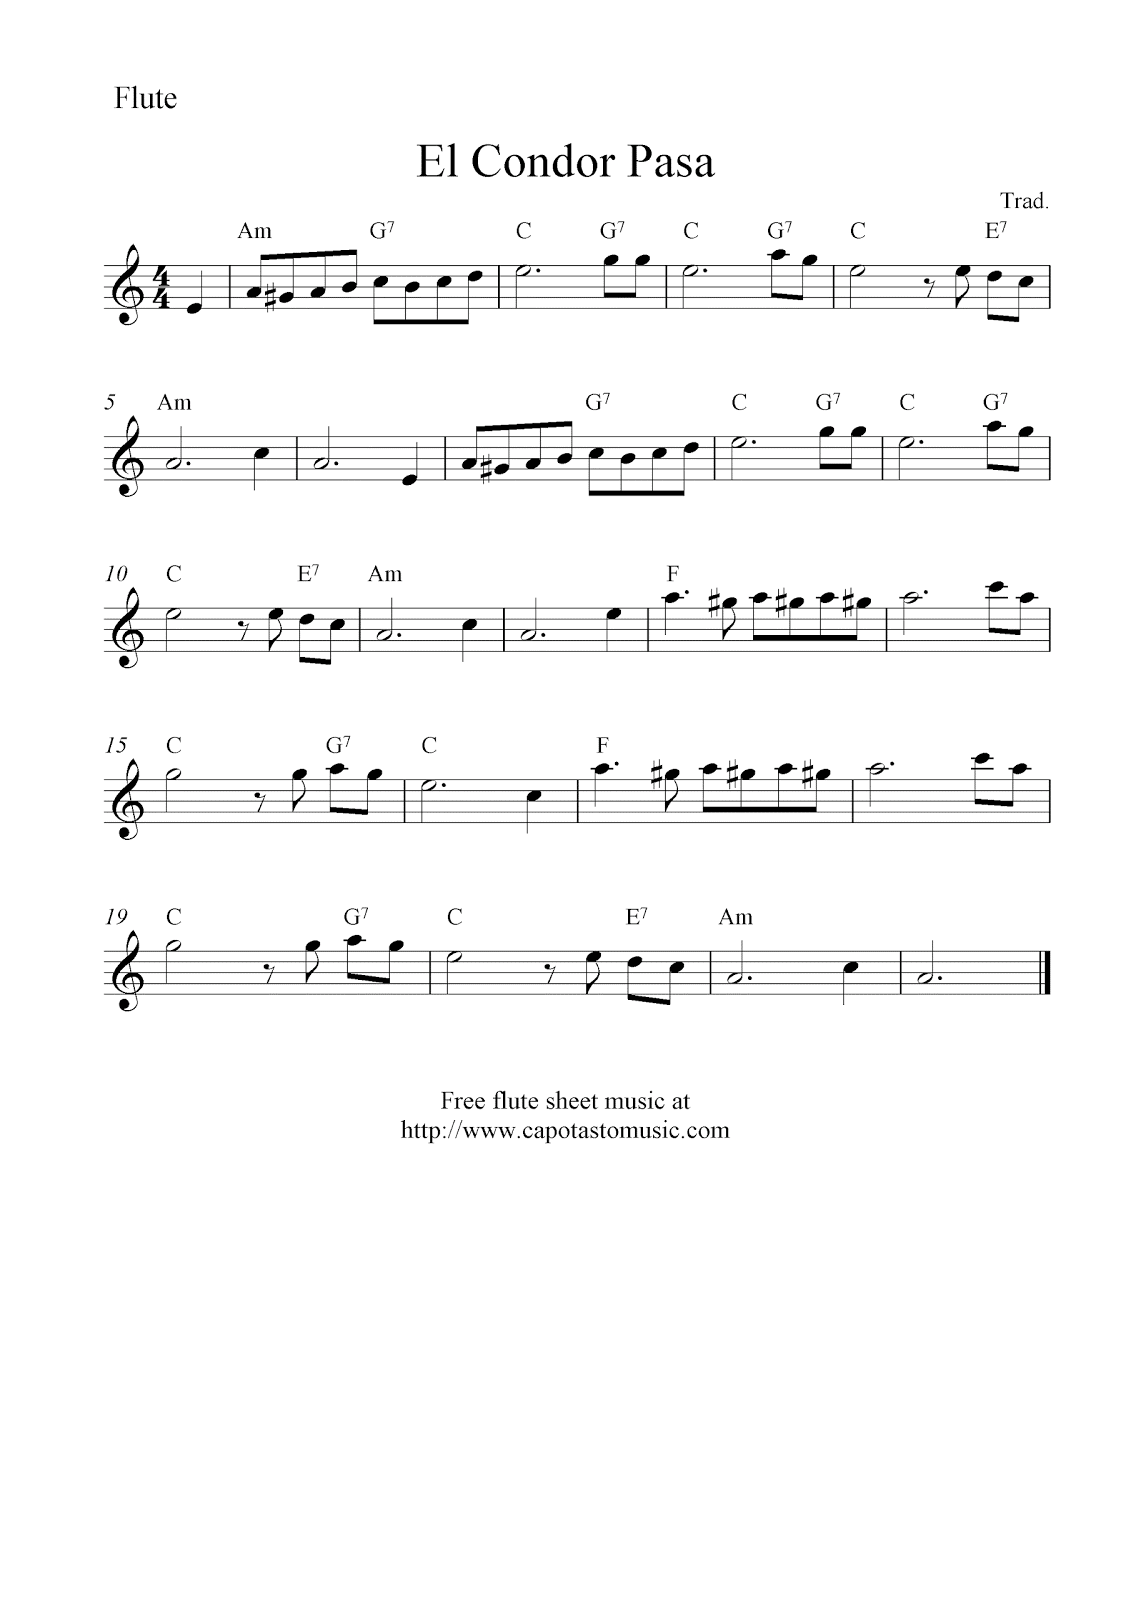 El condor pasa free flute sheet music notes